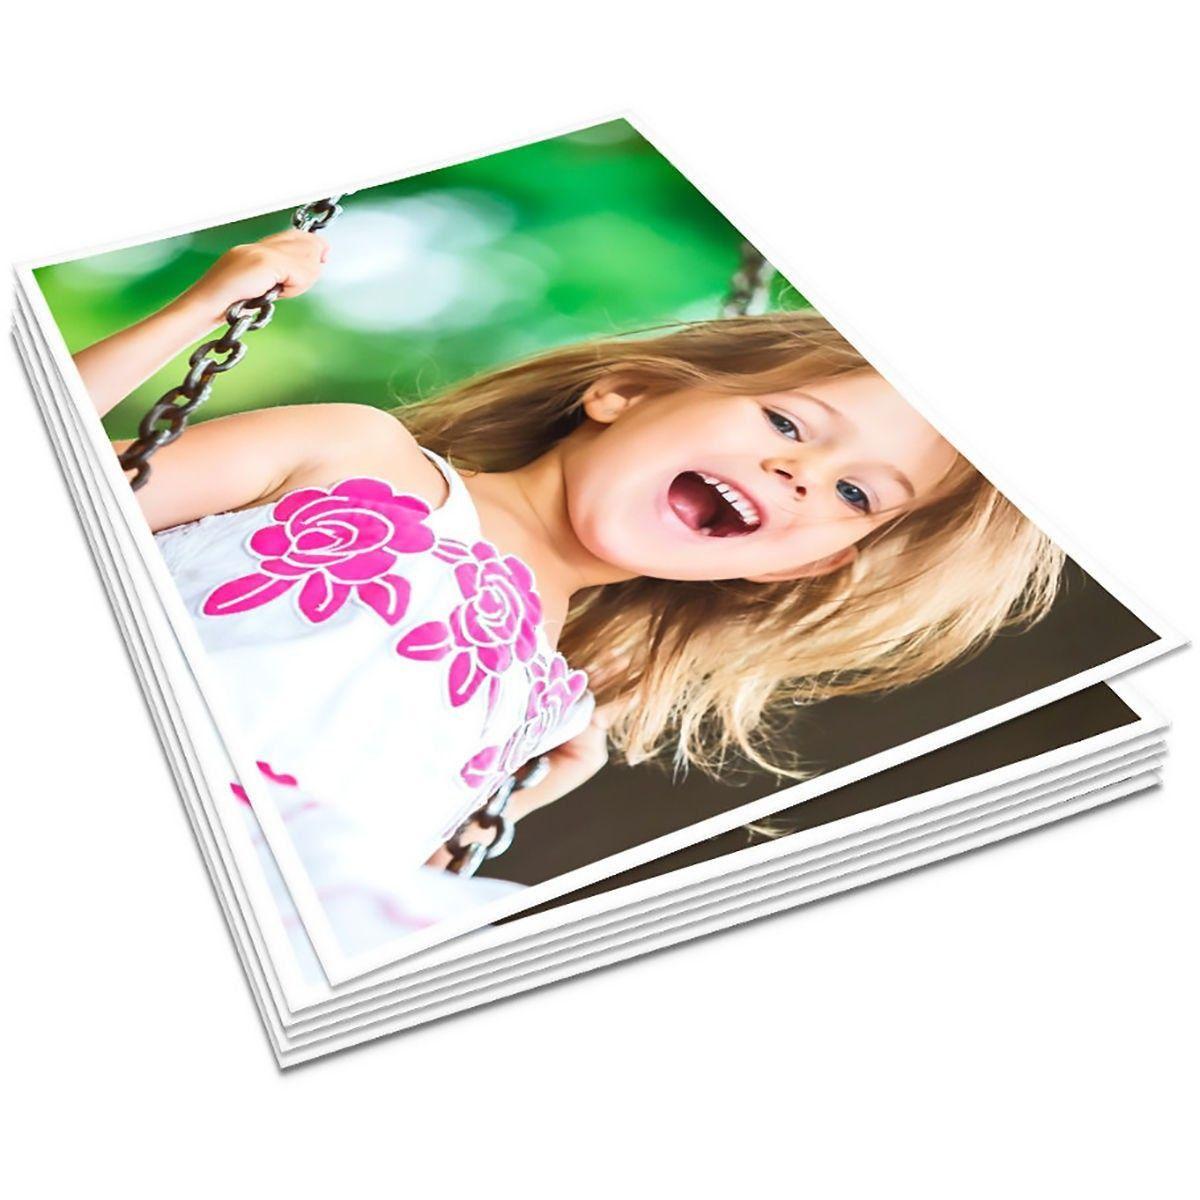 Papel Fotográfico A4 Dupla Face 220g Glossy Branco Brilhante Resistente à Água / 1000 folhas